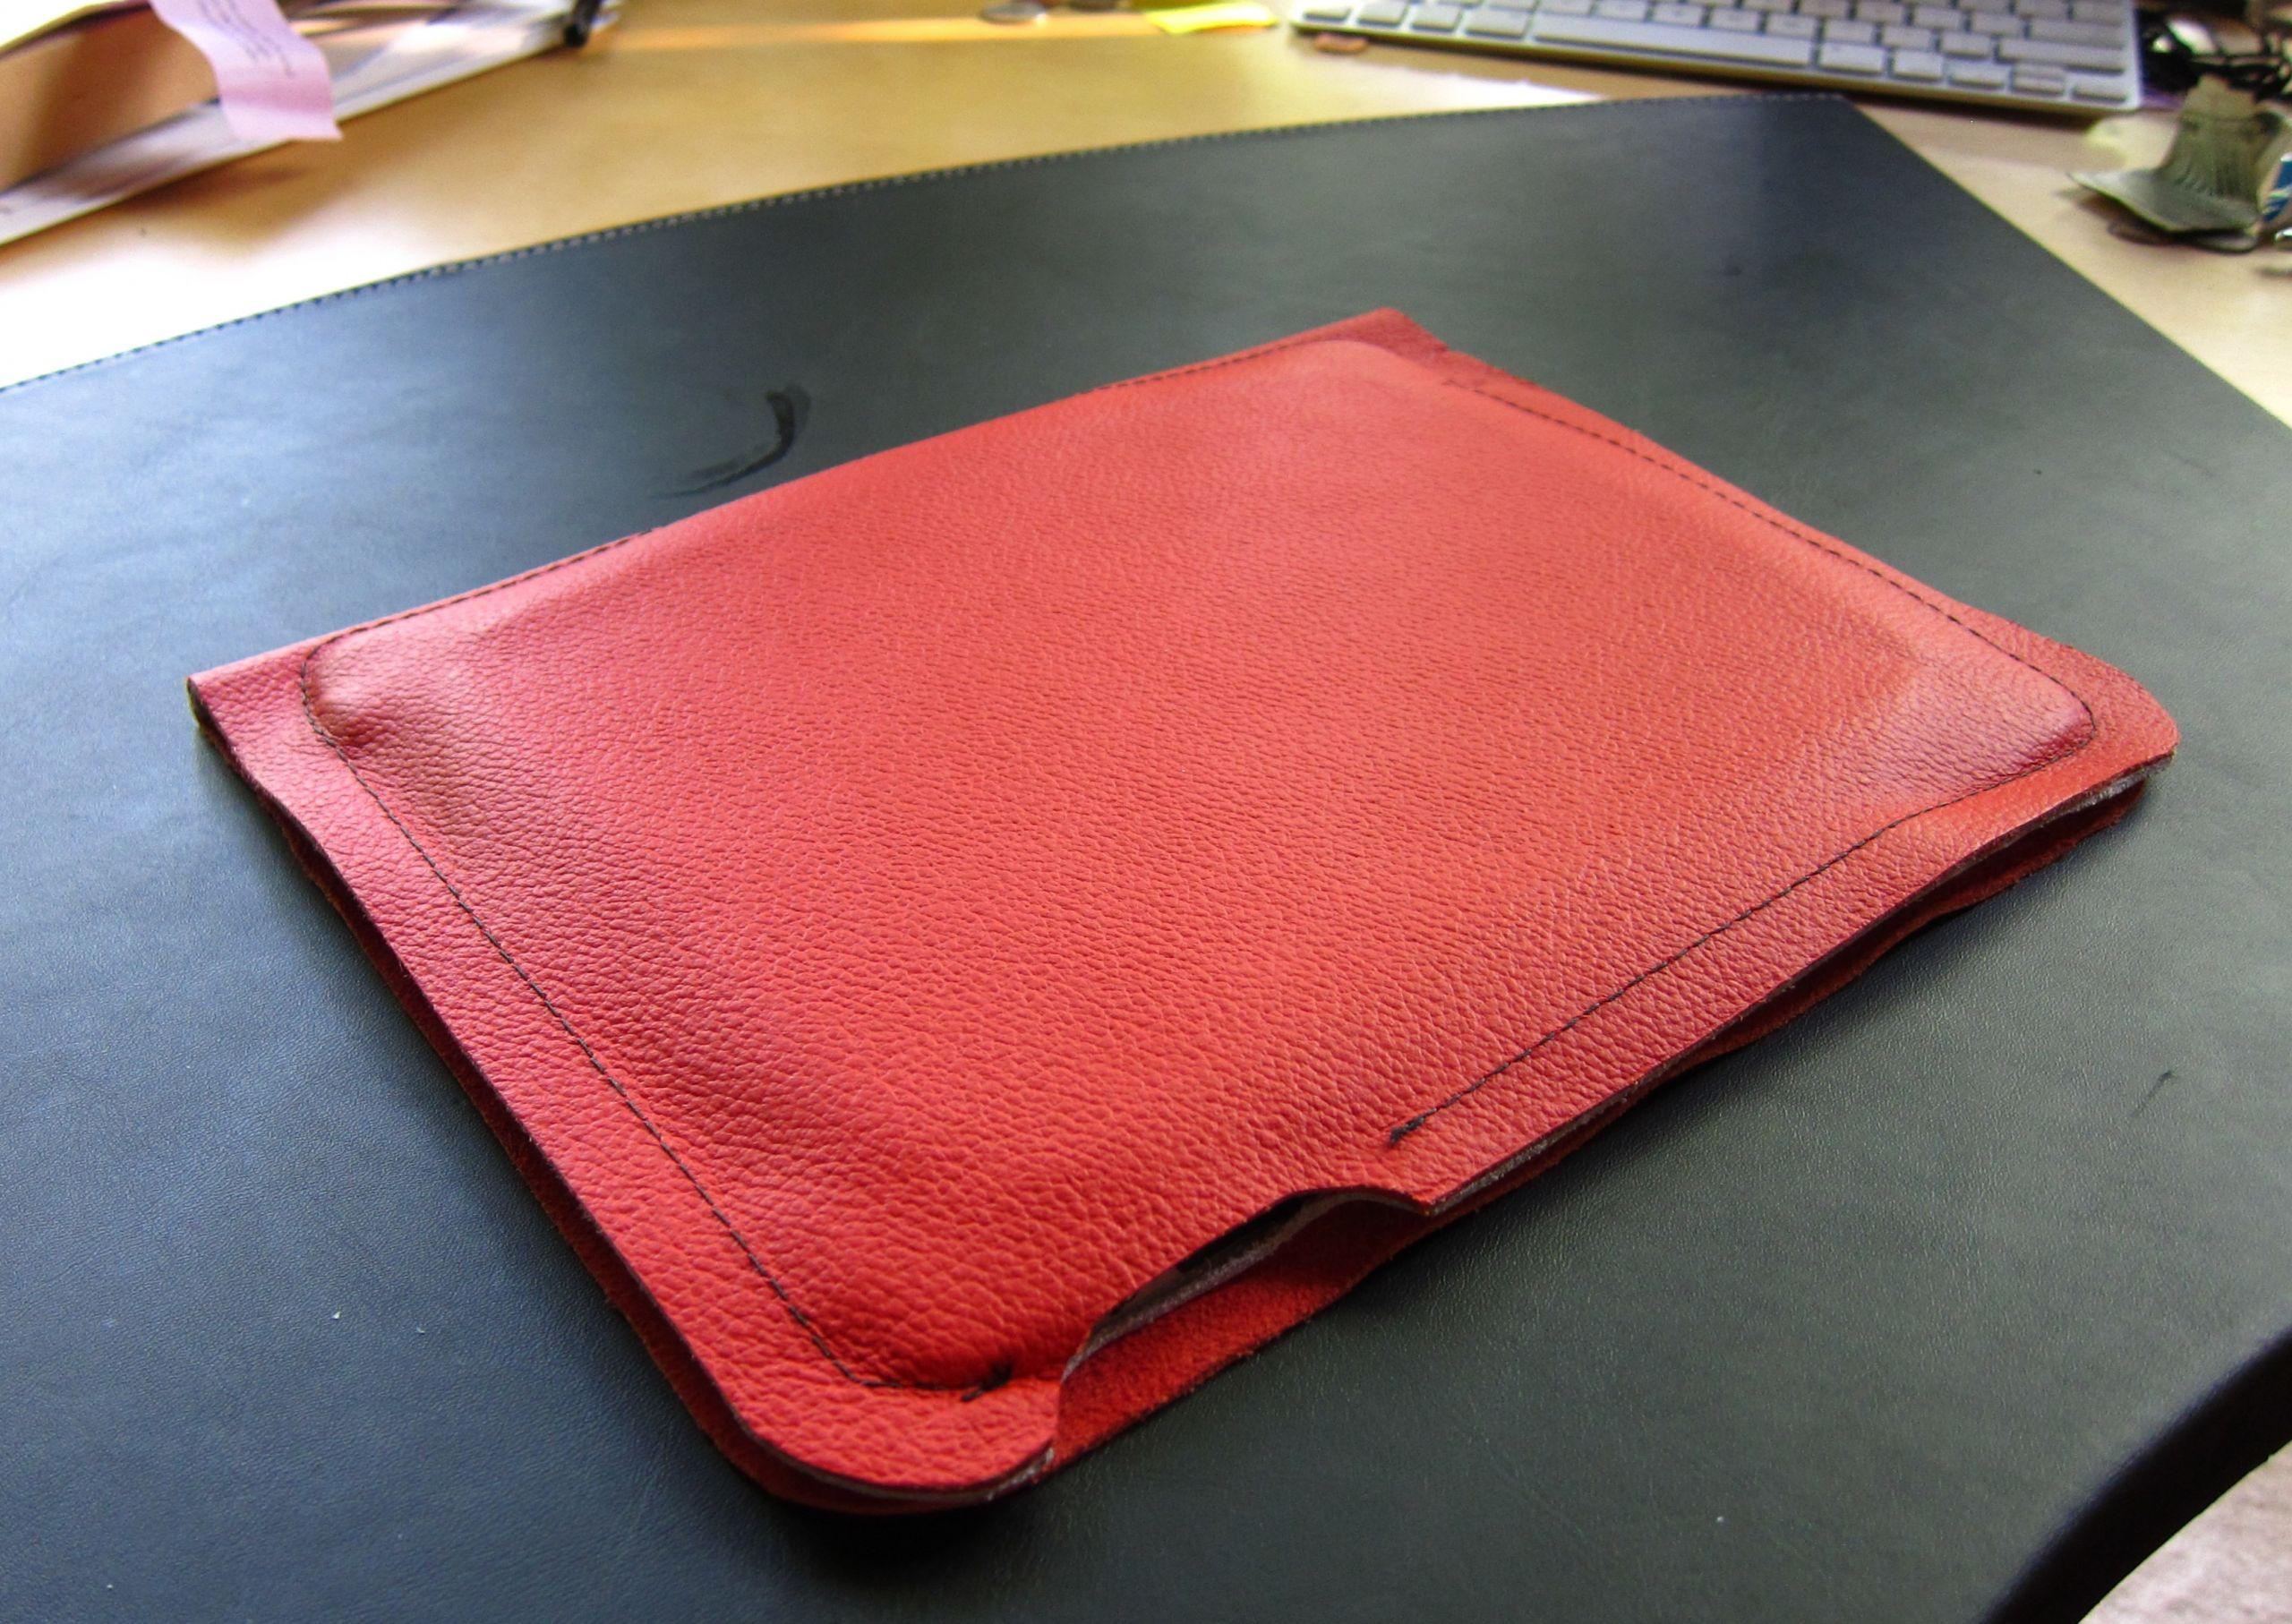 Code Promo Castorama Charmant Custom Leather Case Designed and Made for the Ipad